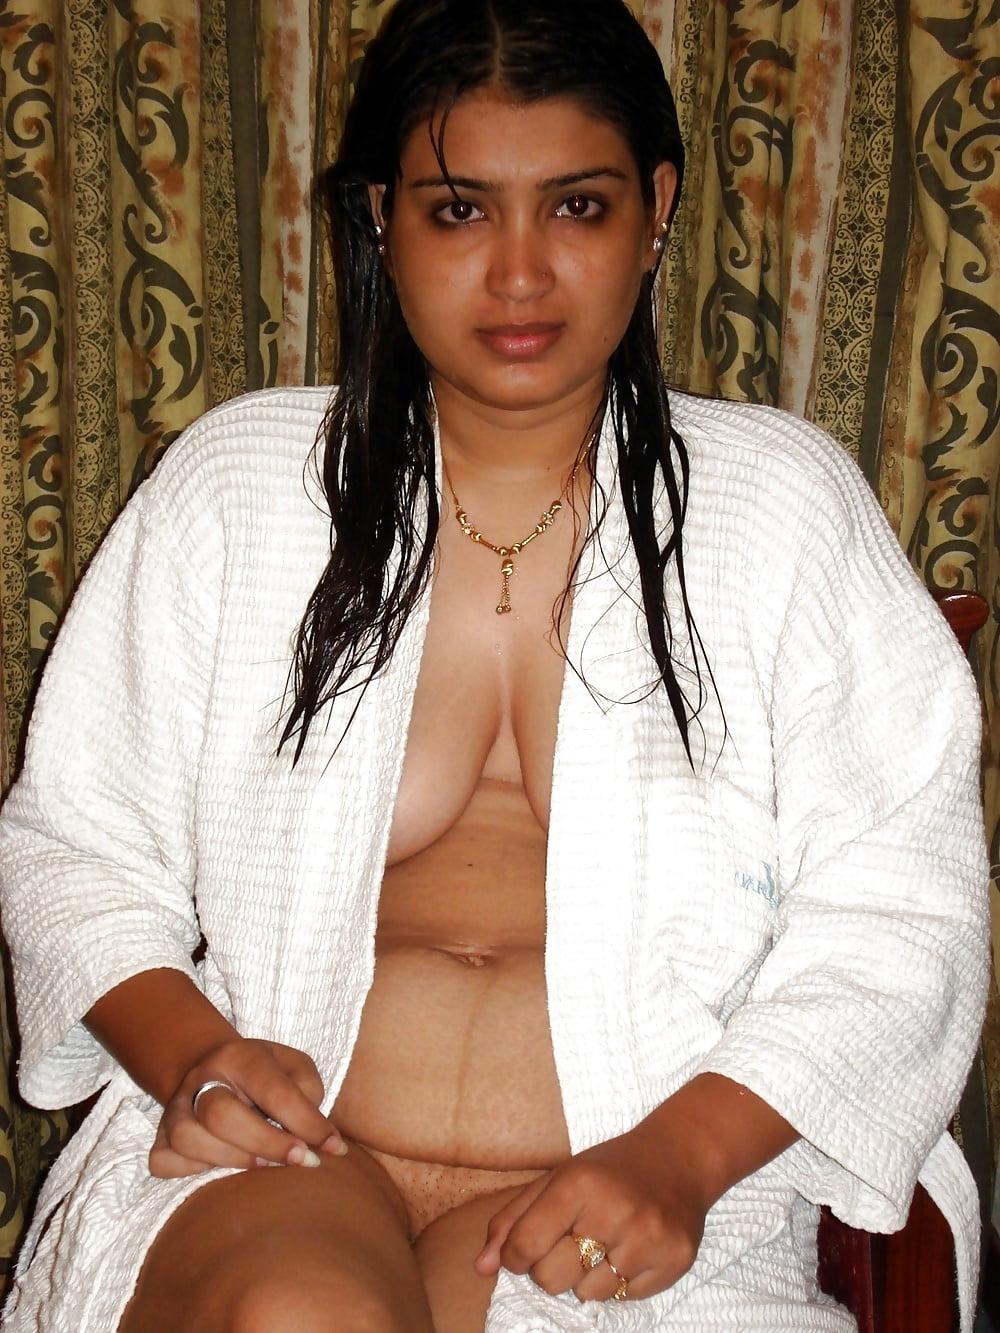 beautiful-nude-images-of-pak-girls-boys-having-sex-girl